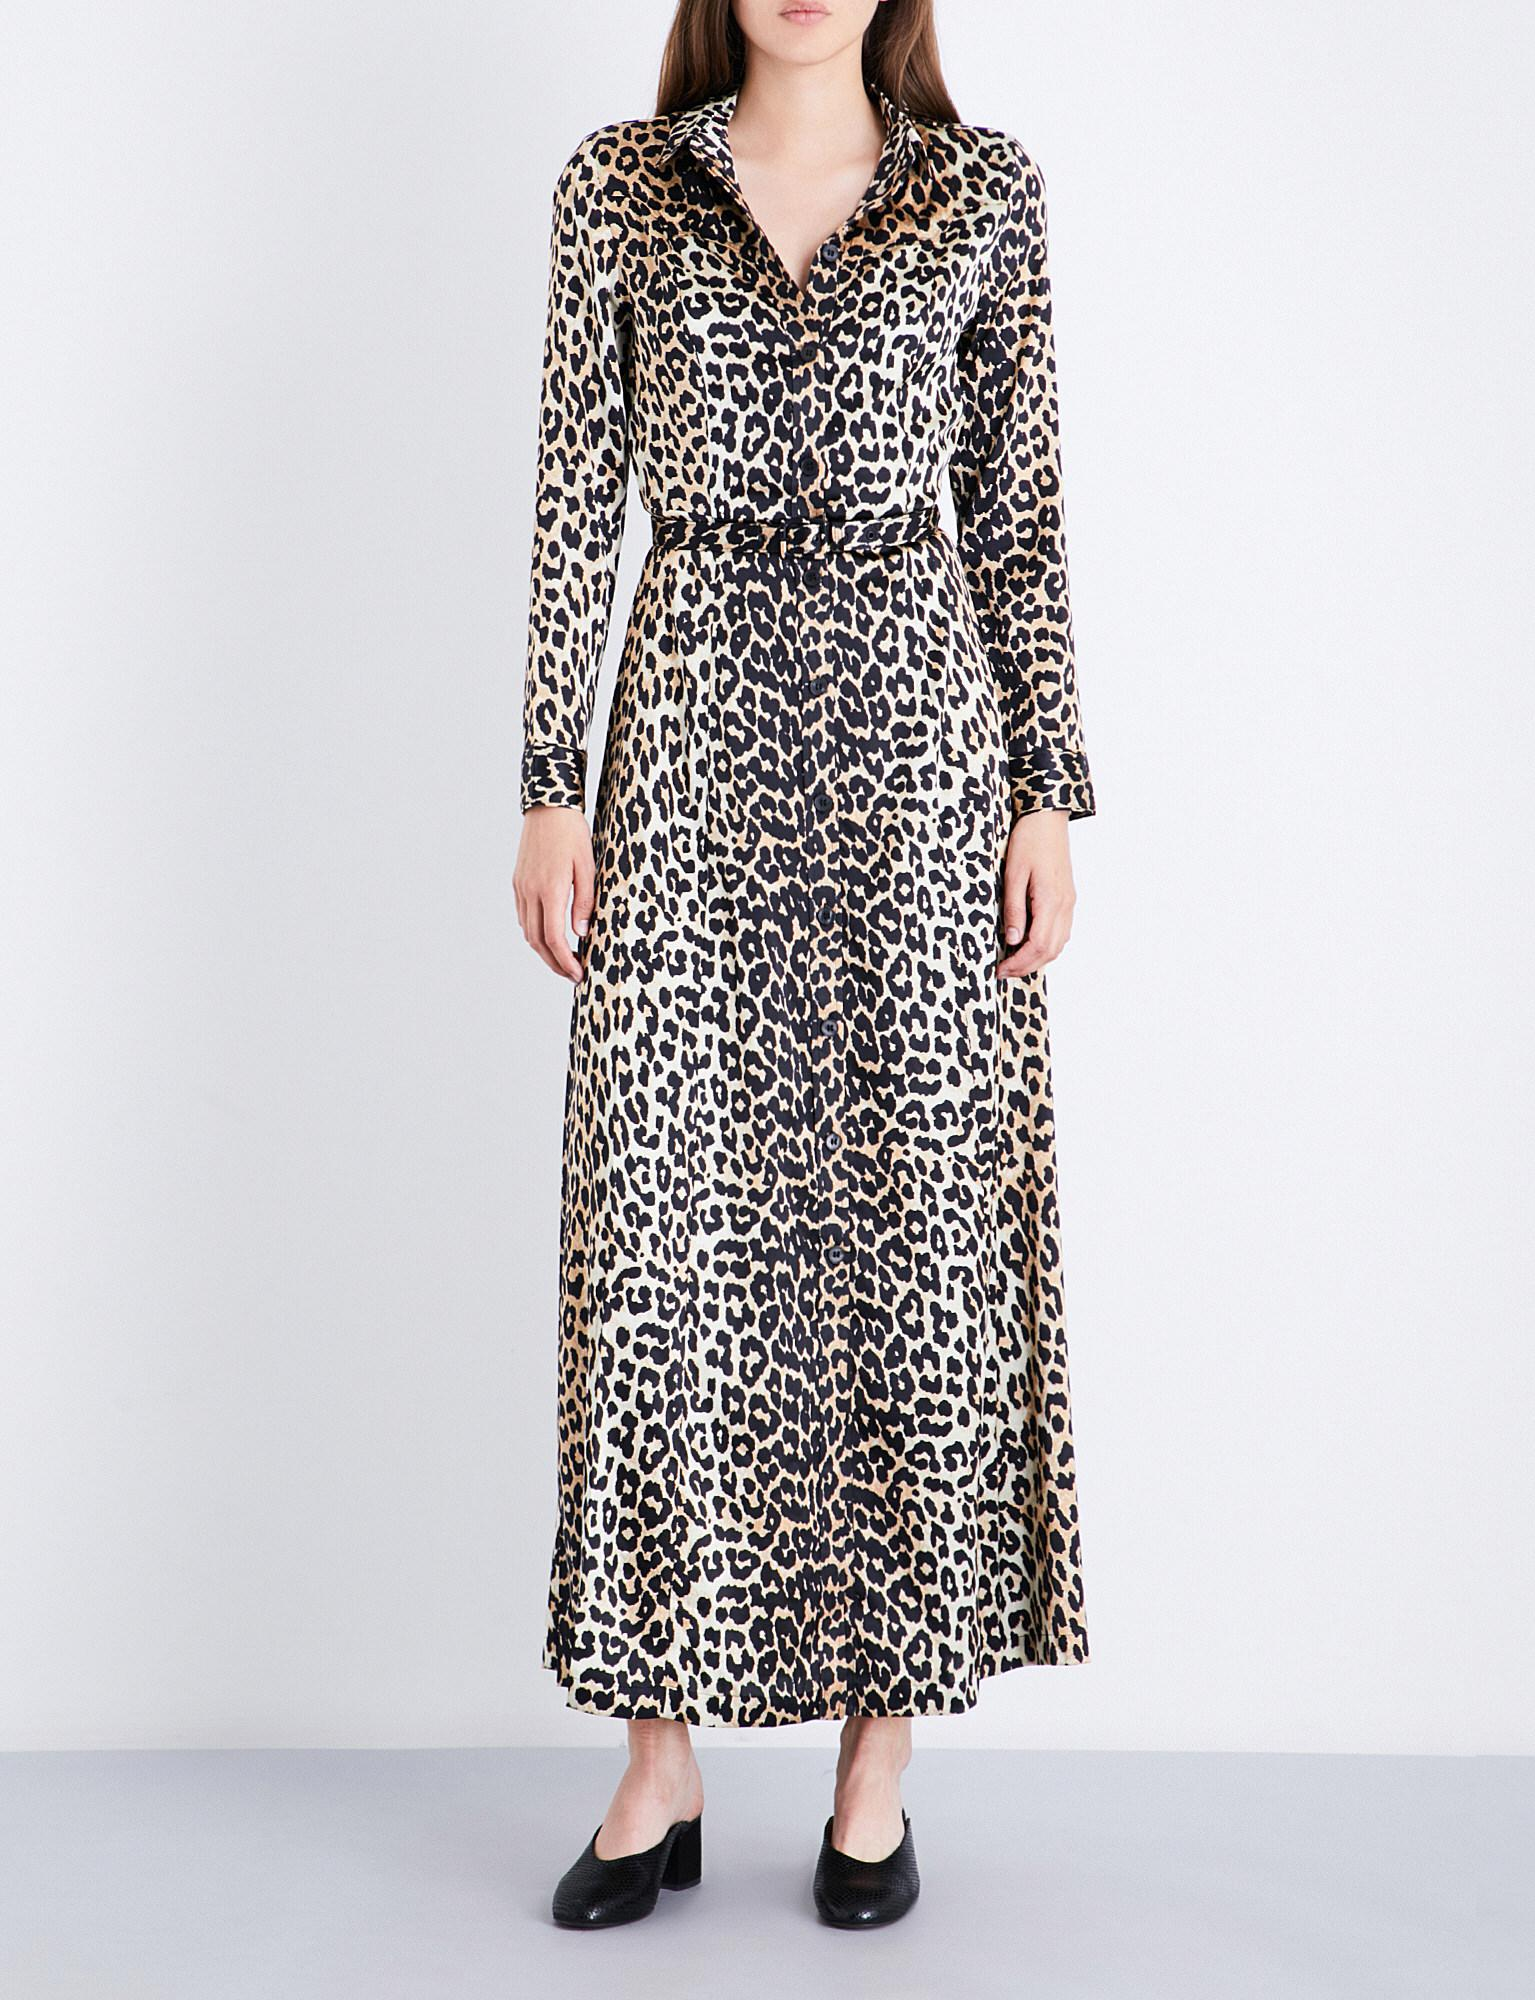 57d215d5 Ganni Dufort Silk Dress in Black - Lyst